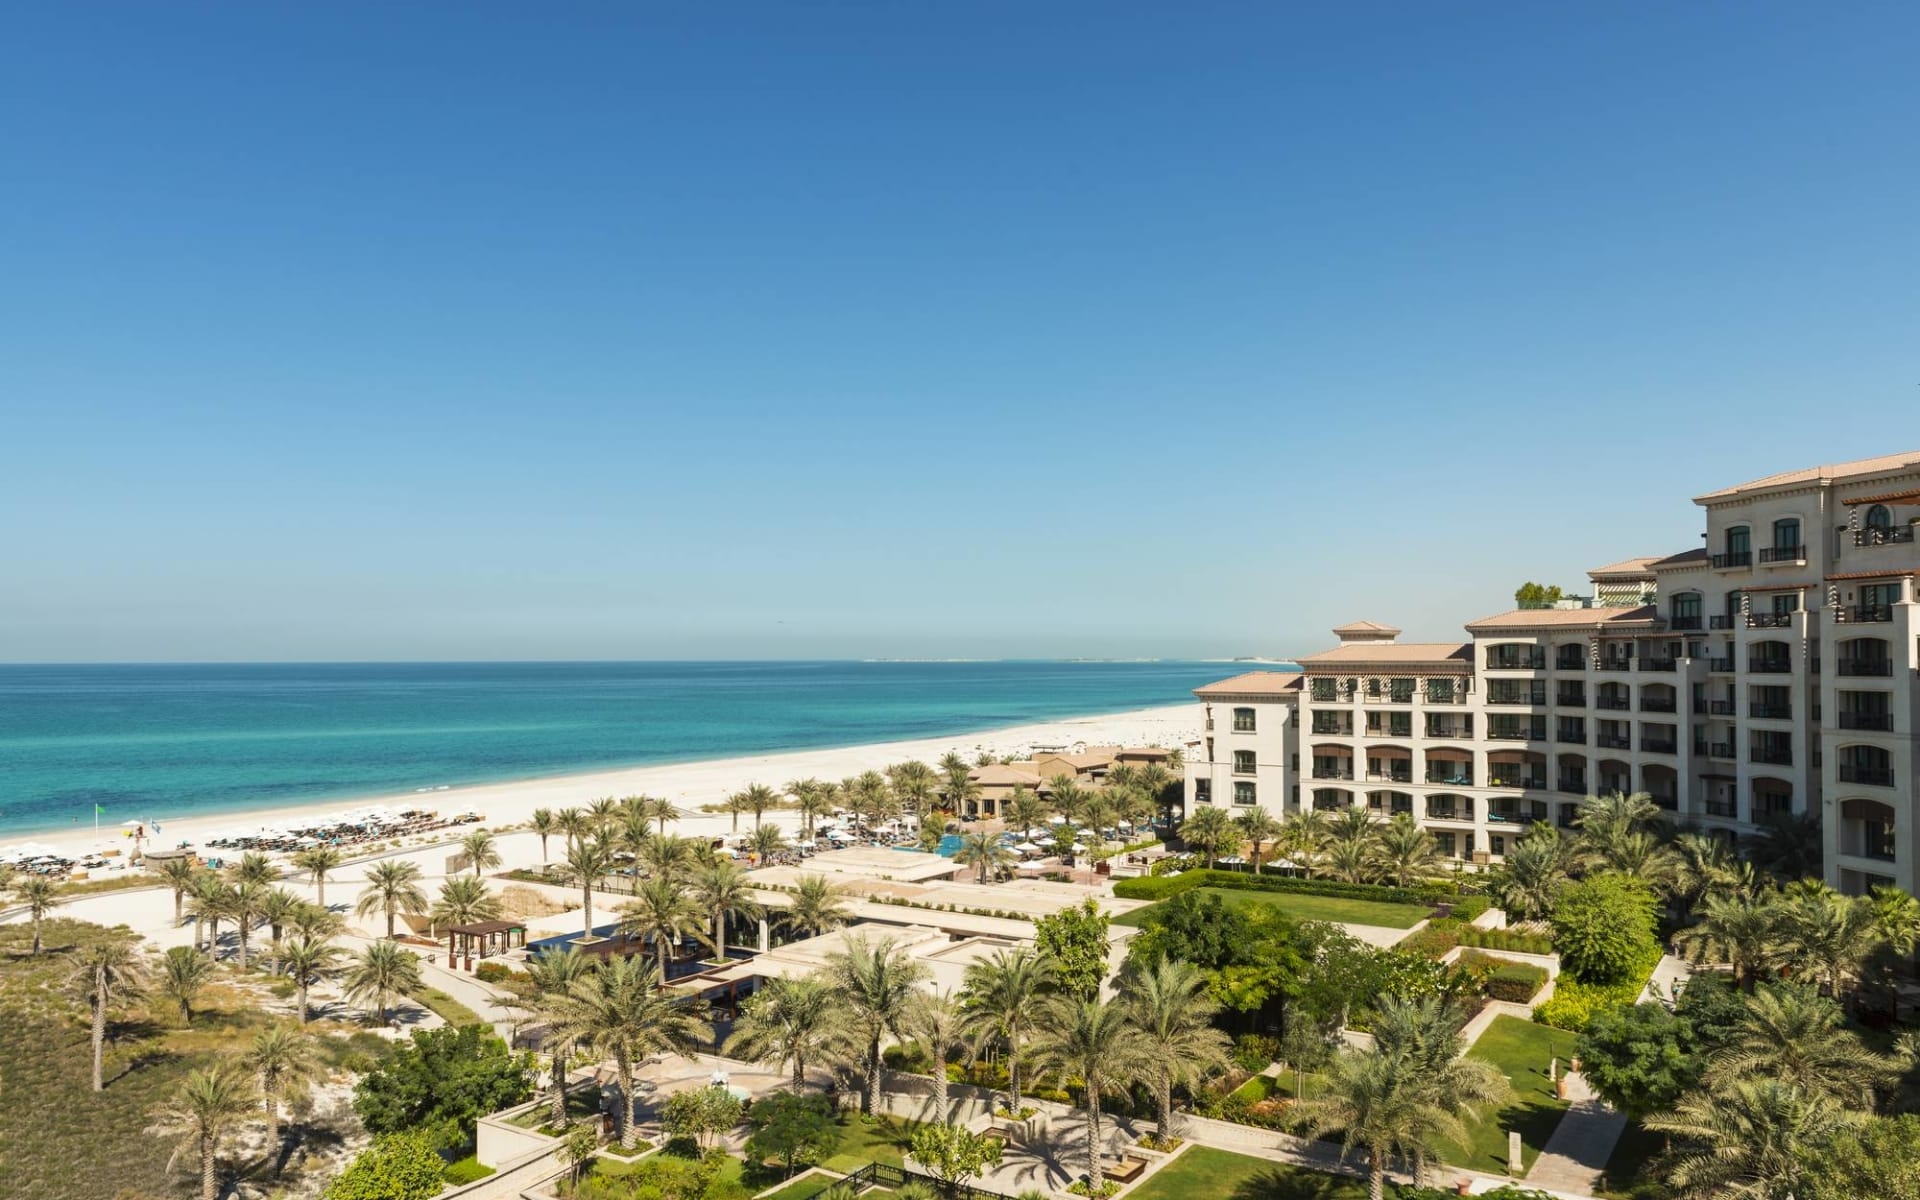 St. Regis Saadiyat Island Resort Abu Dhabi: